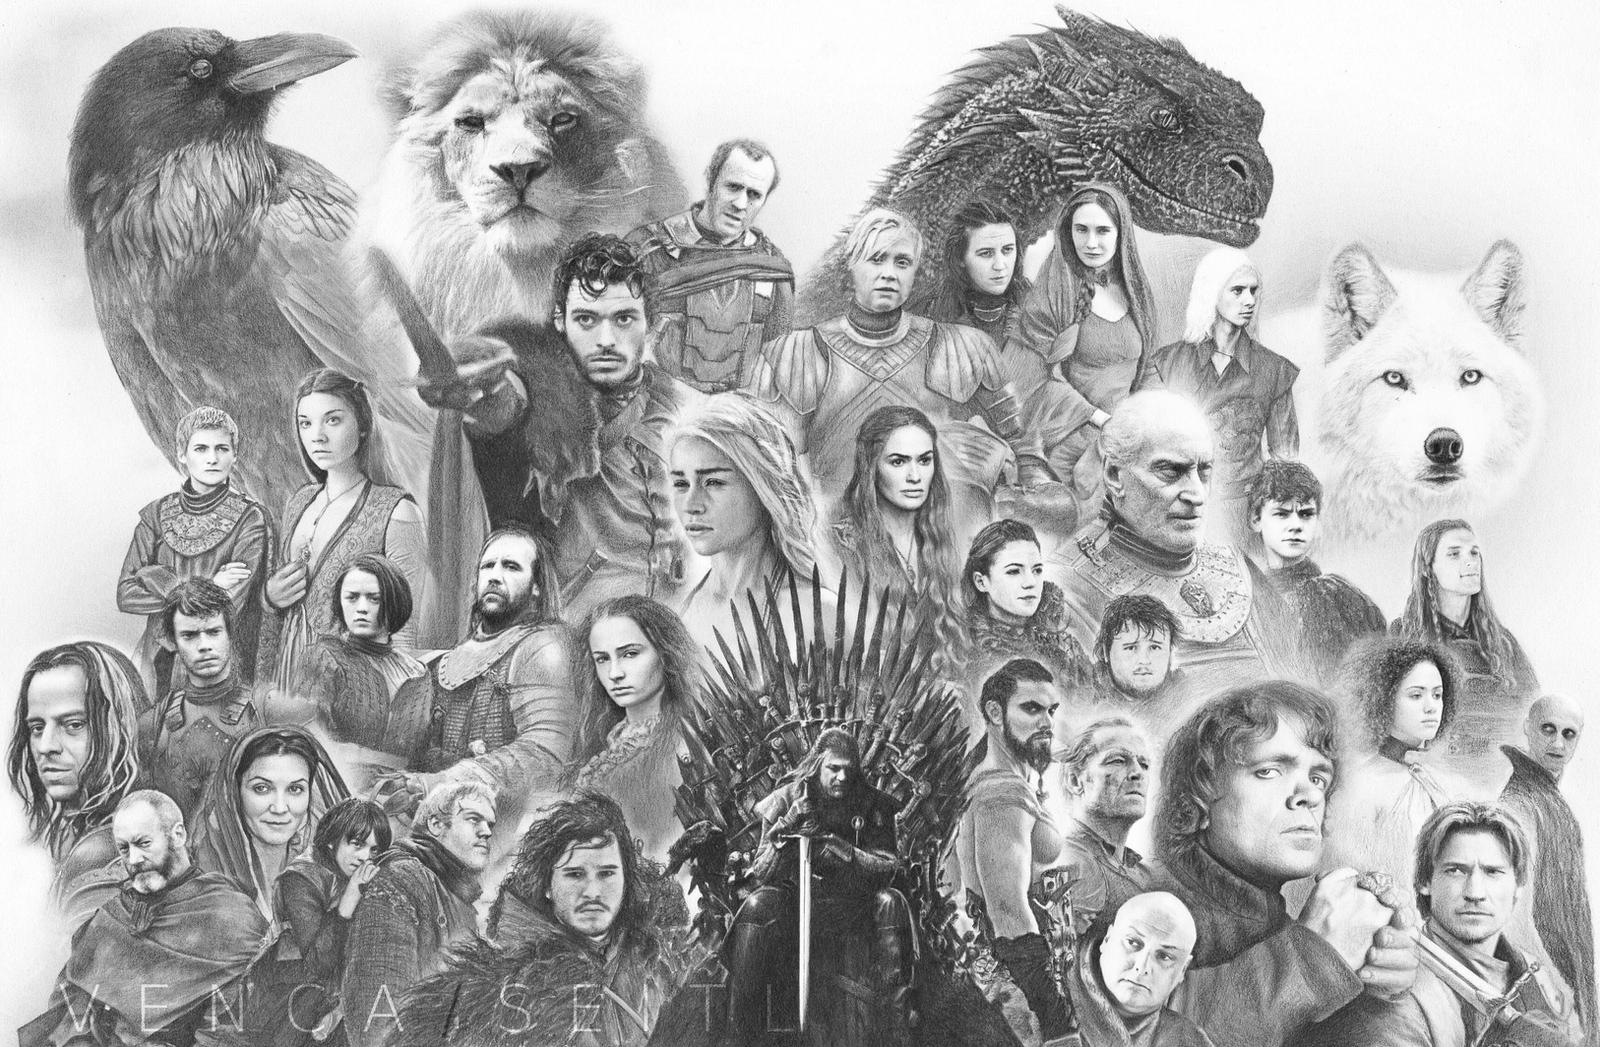 Game of Thrones by VencaSeitl